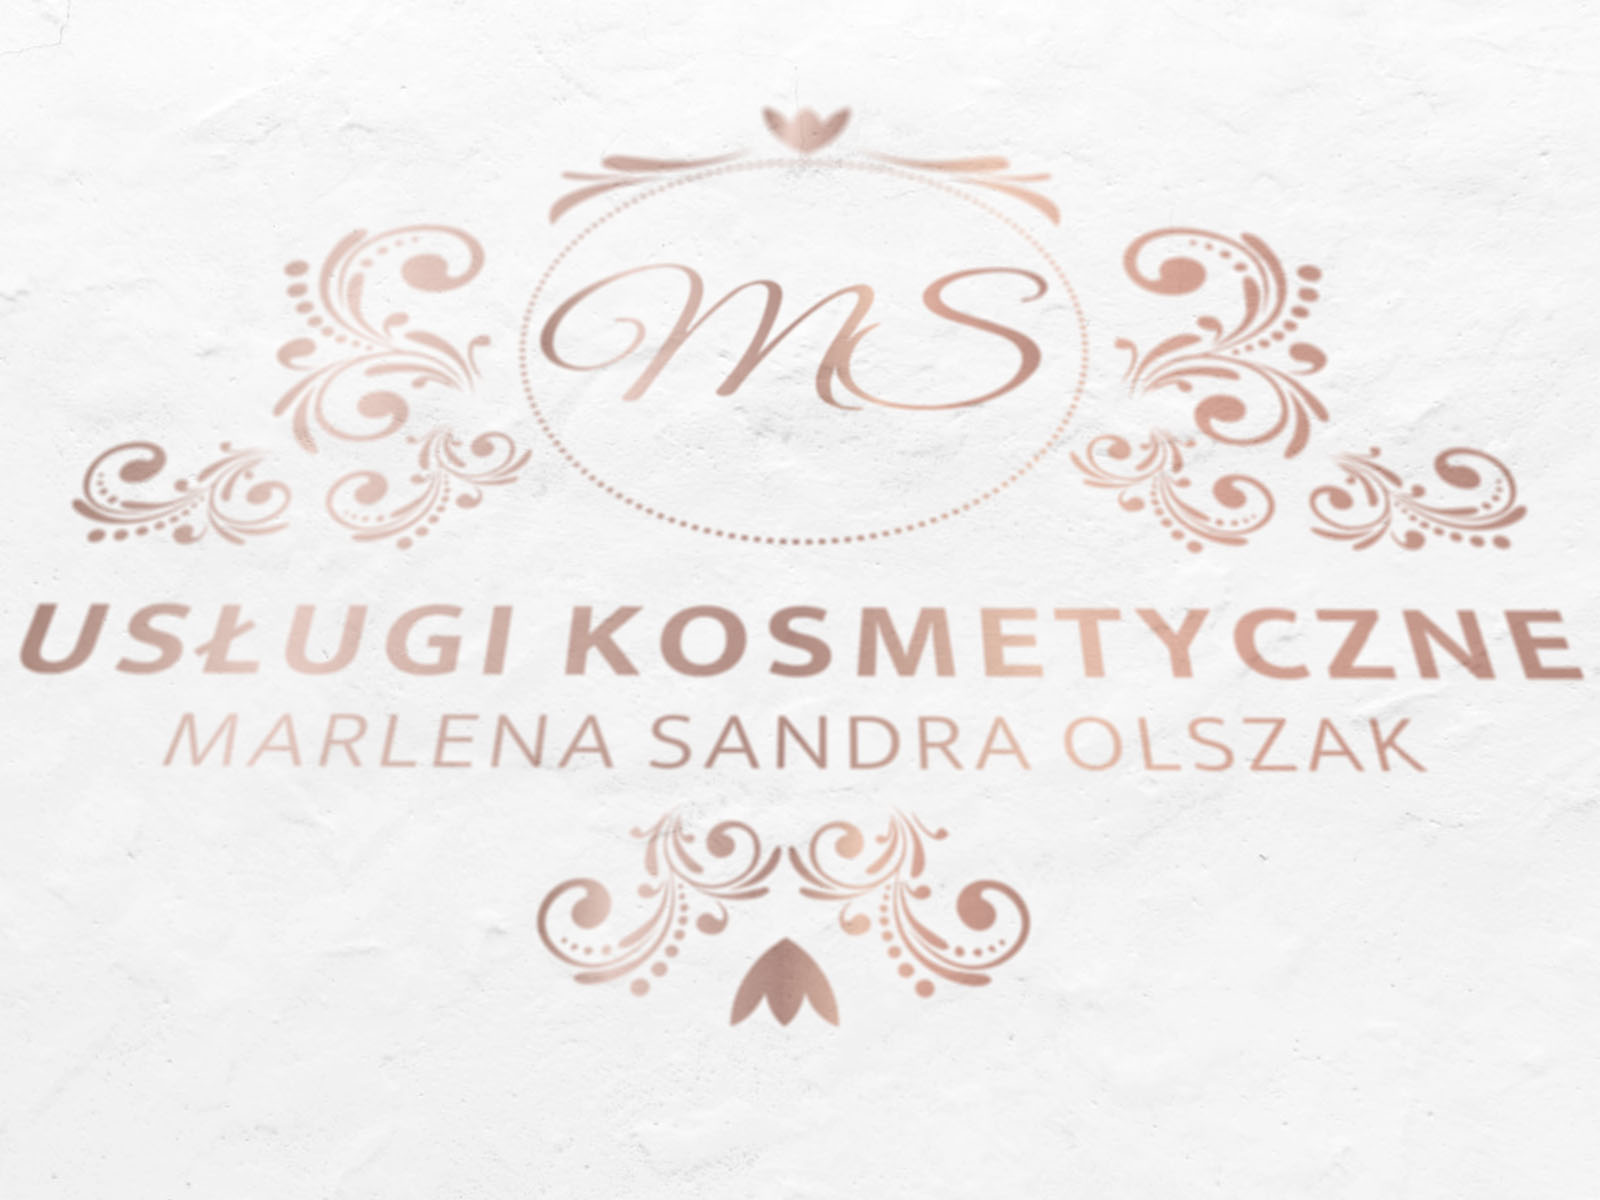 Logo dla Marleny Sandry Olszak - Usługi kosmetyczne